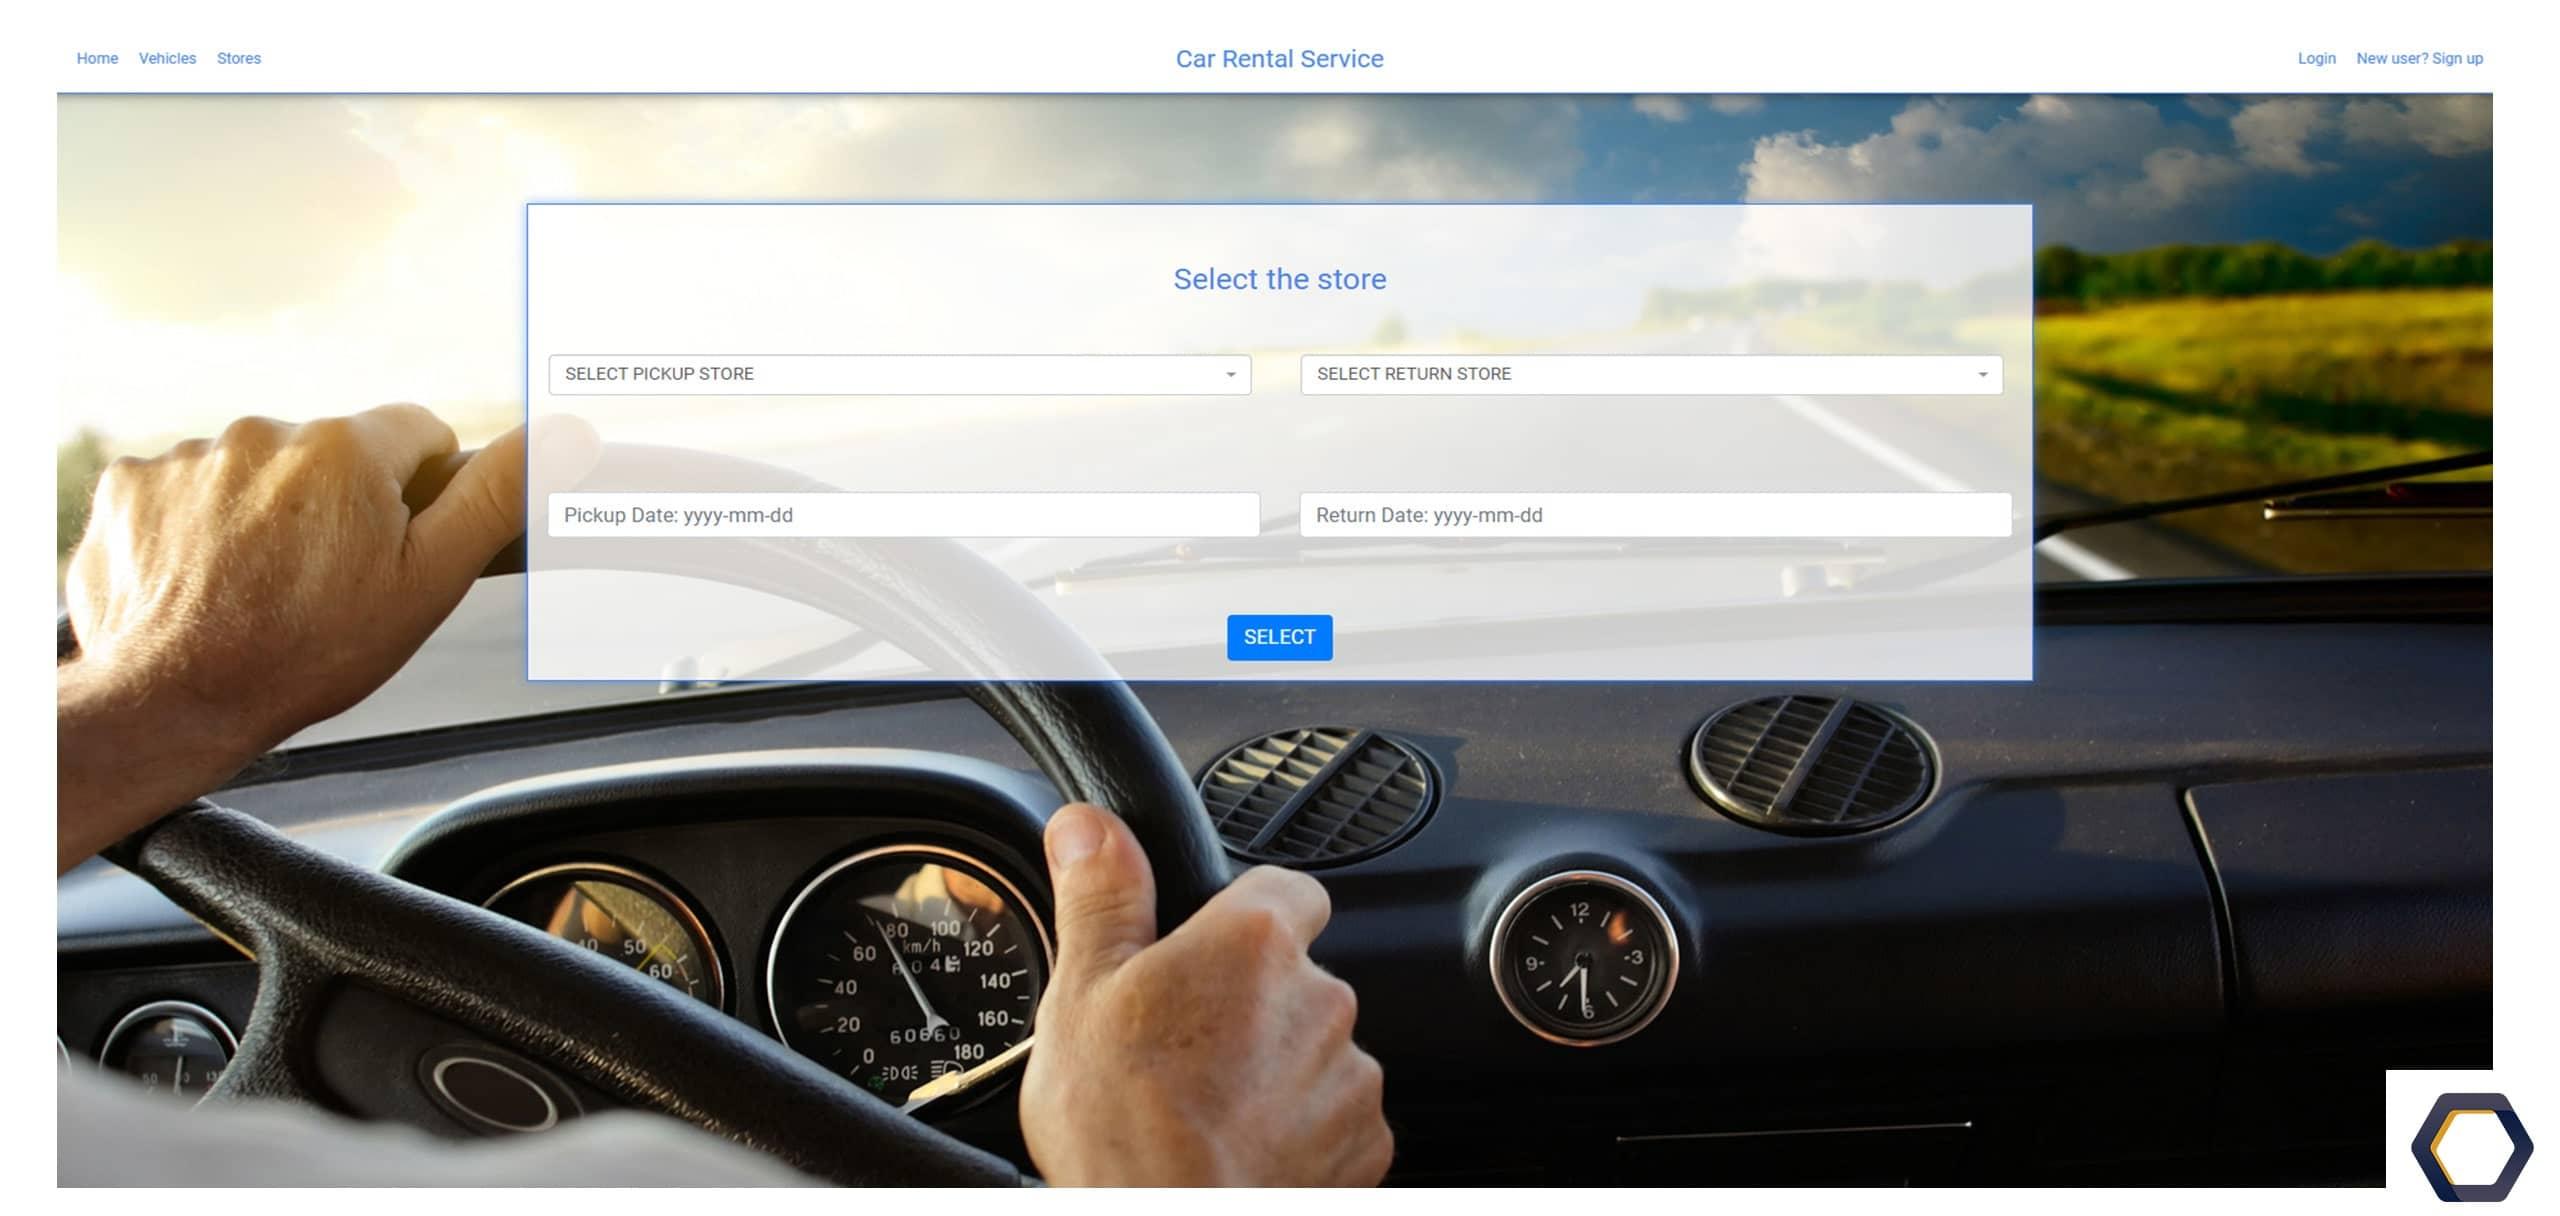 Car Rental System QUT IFB299 (Project Management) Project | Raidan.com.au